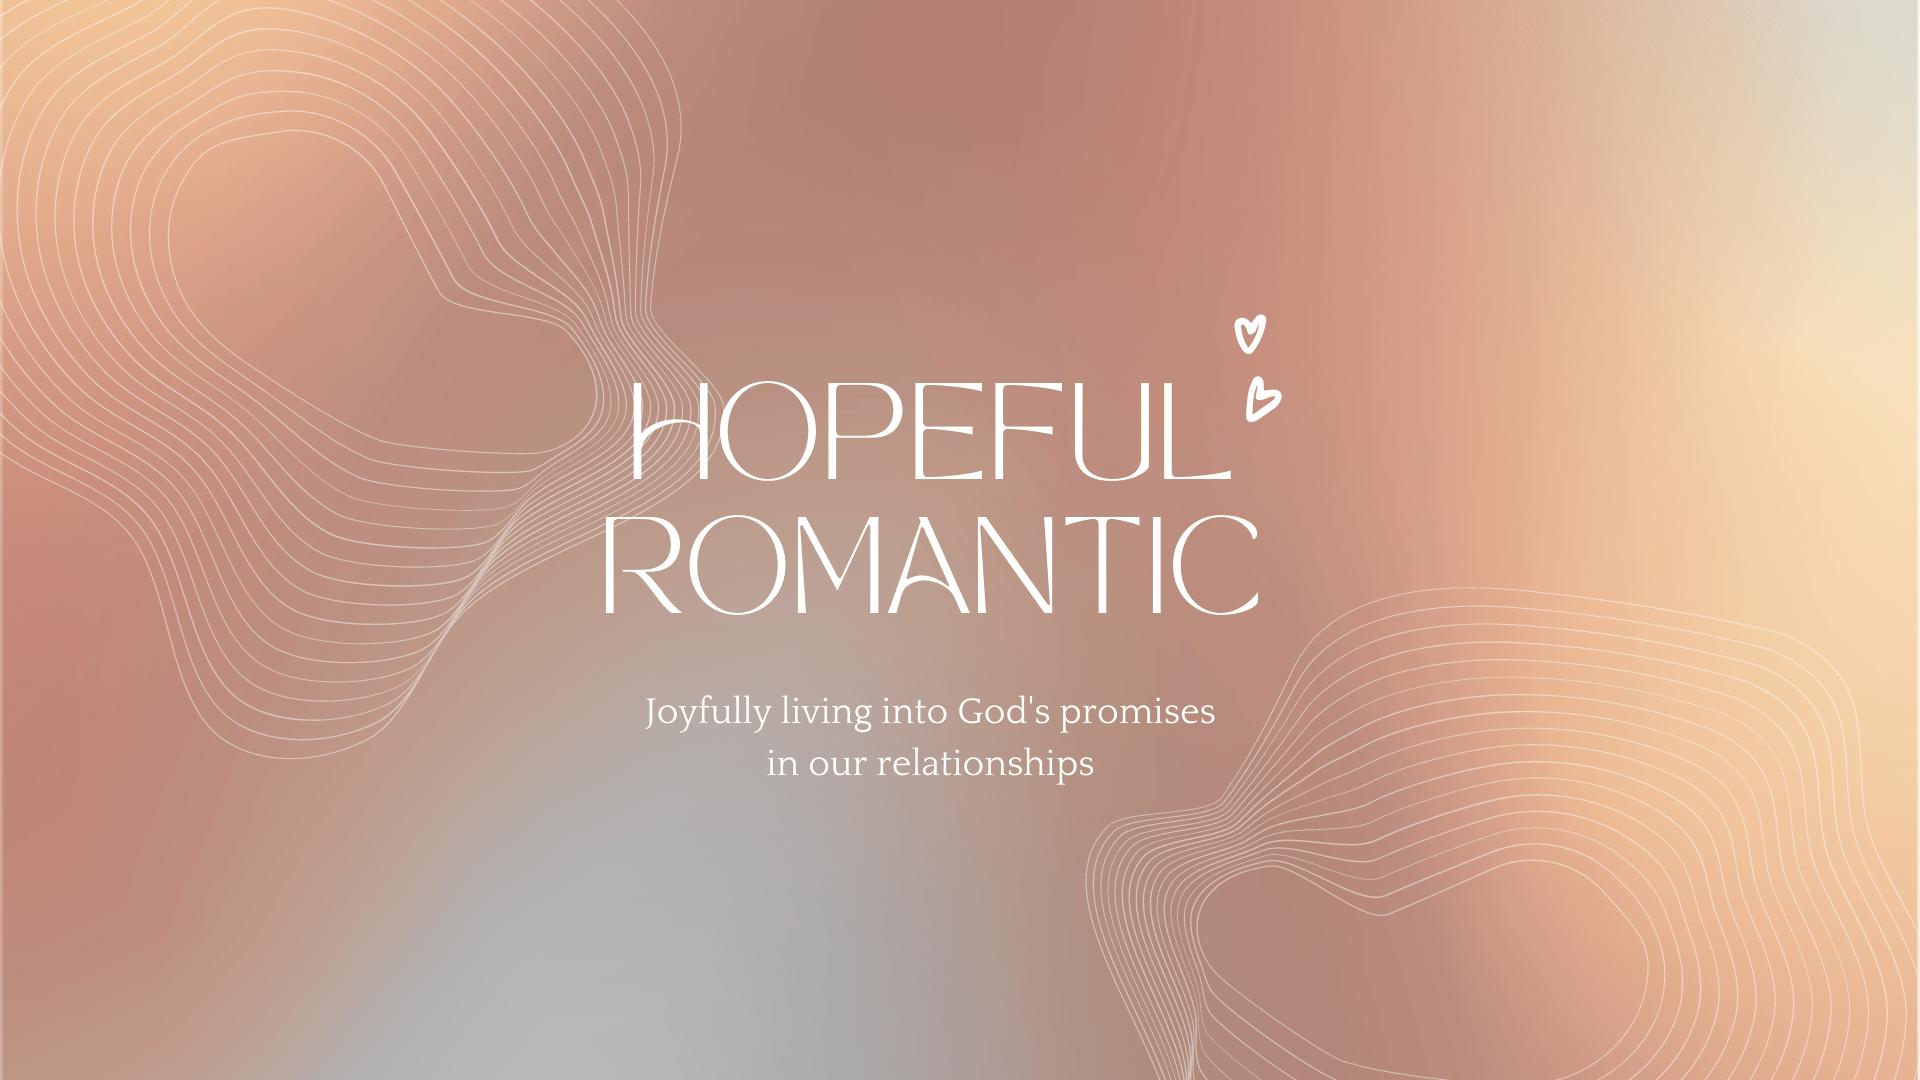 Hopeful Romantic, Pt. 1